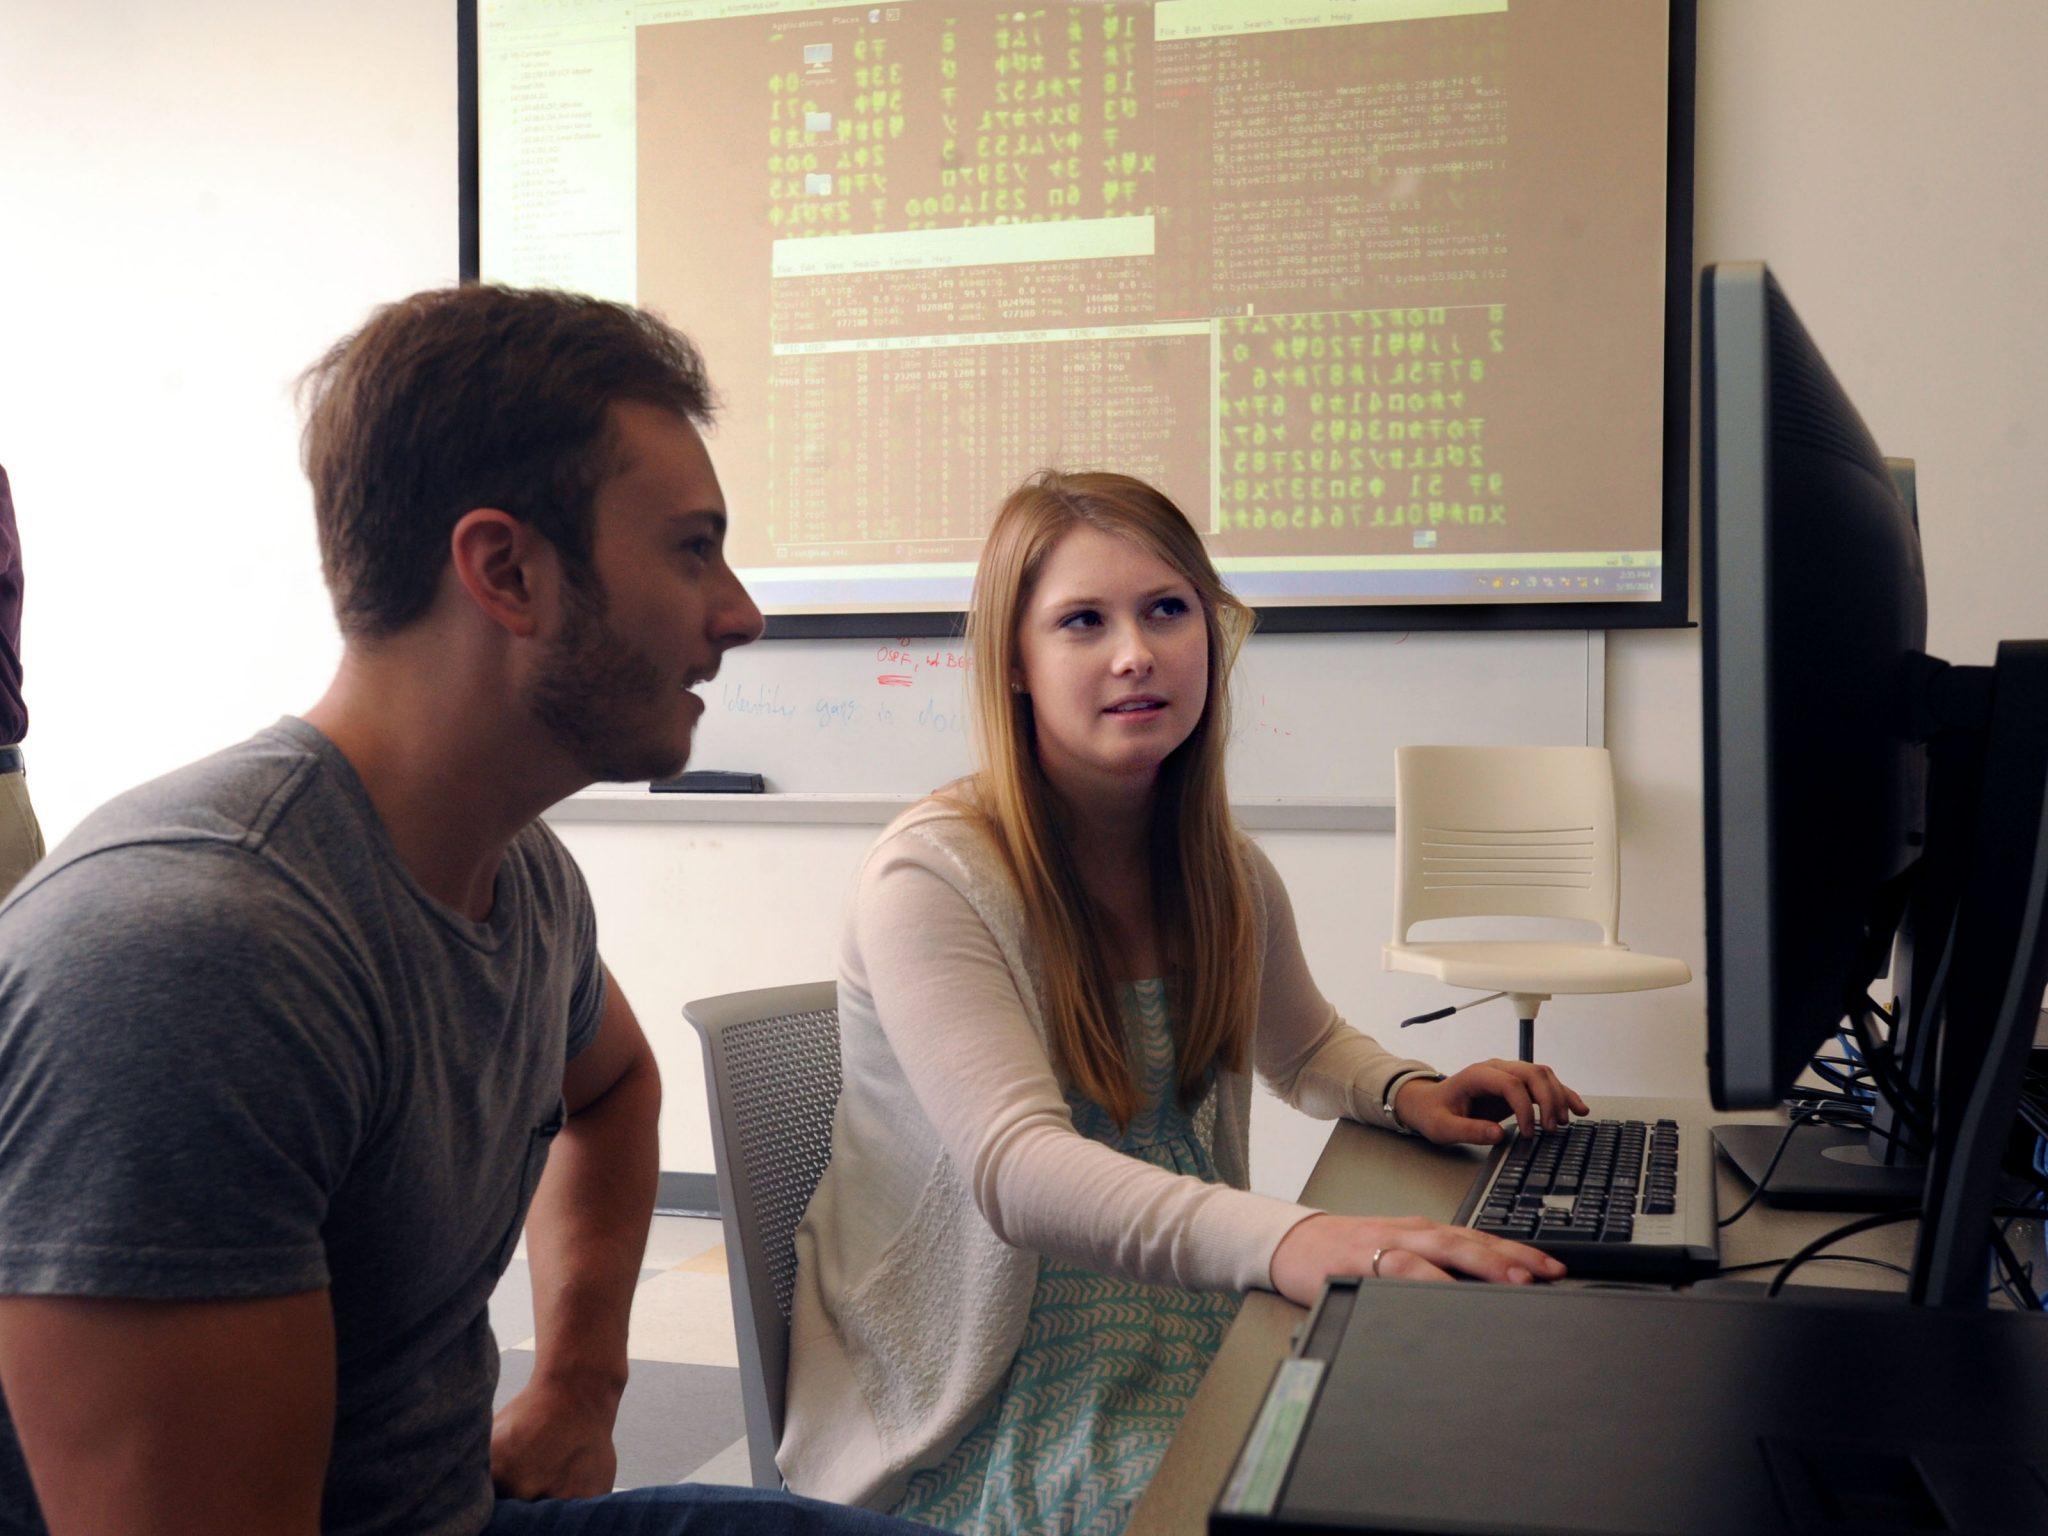 Uwf Cybersecurity Graduate Program Earns Professional